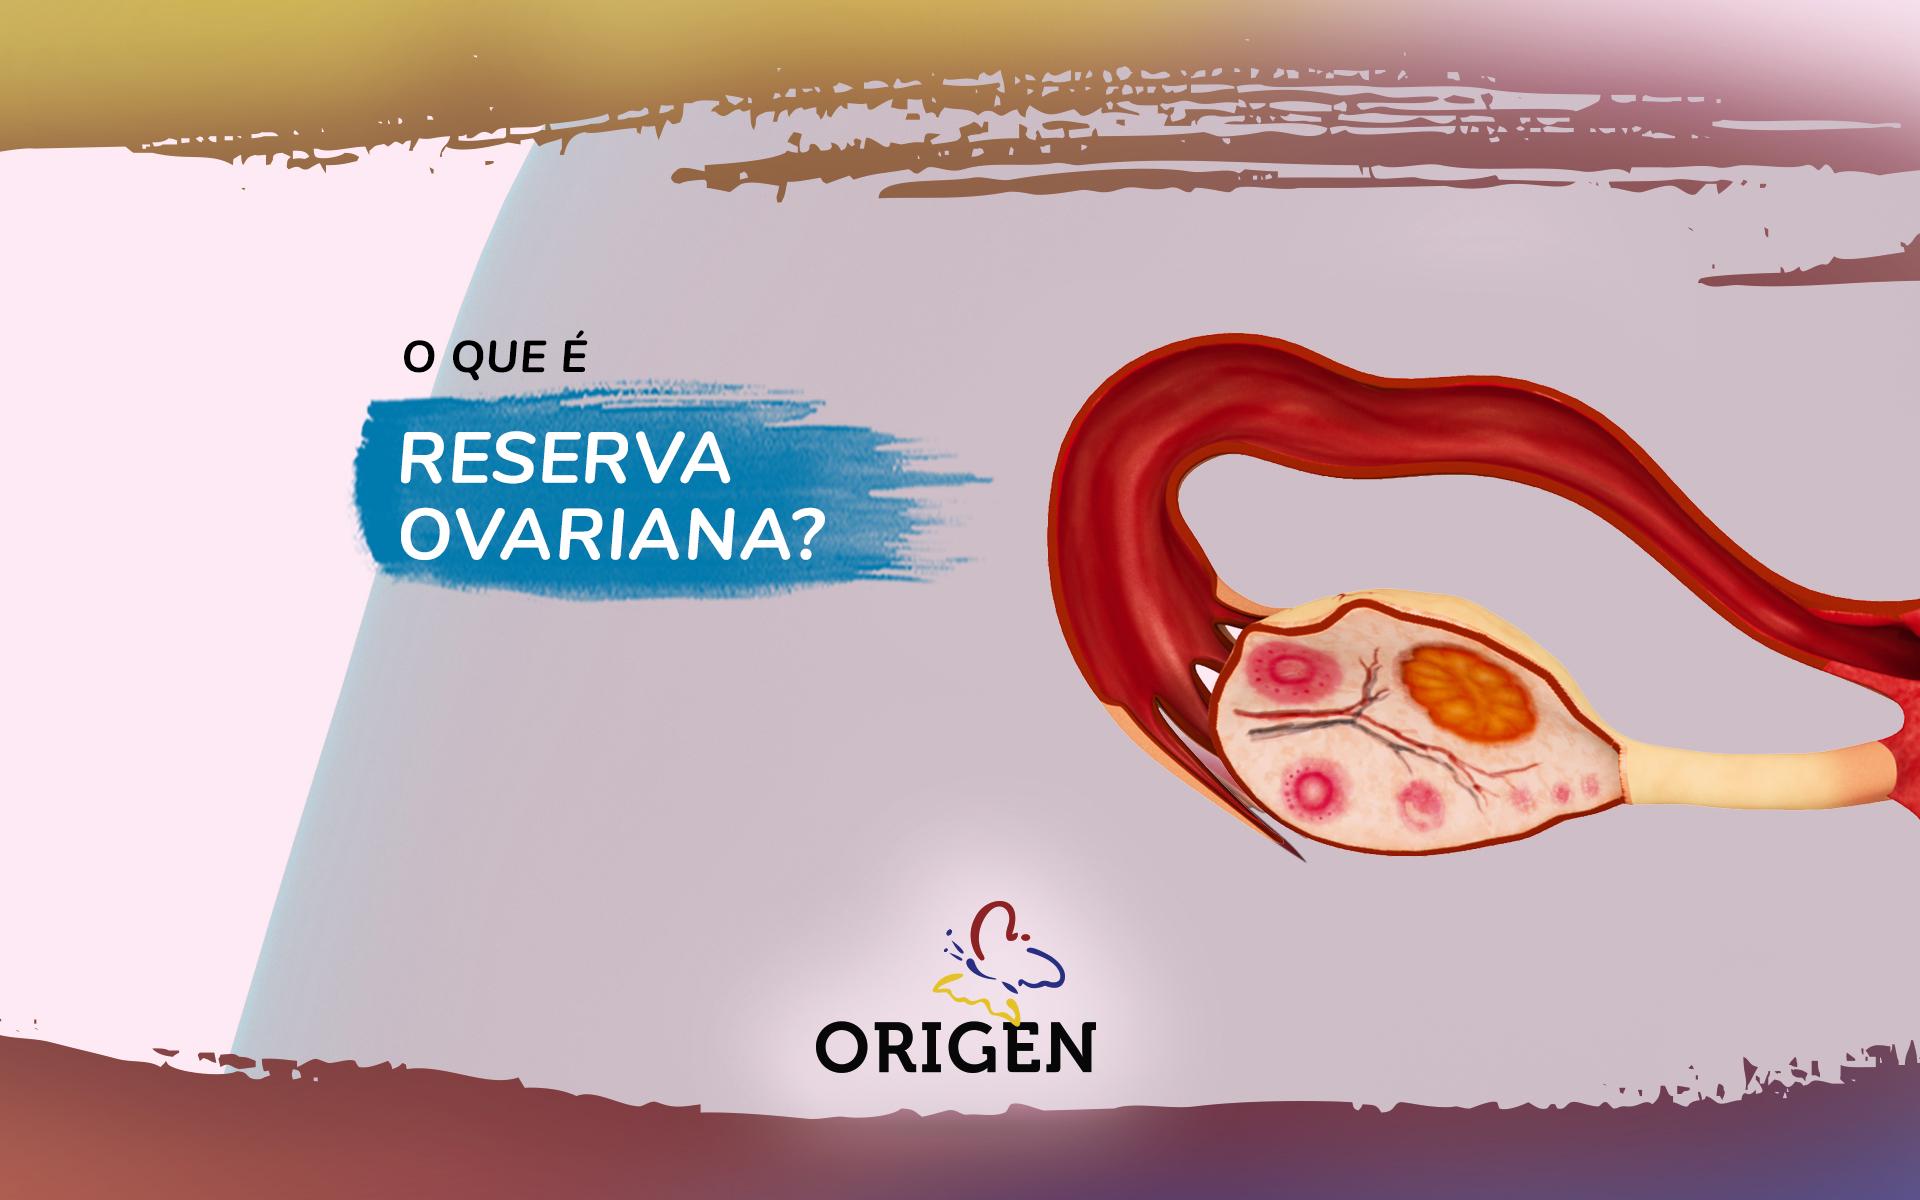 O que é reserva ovariana?